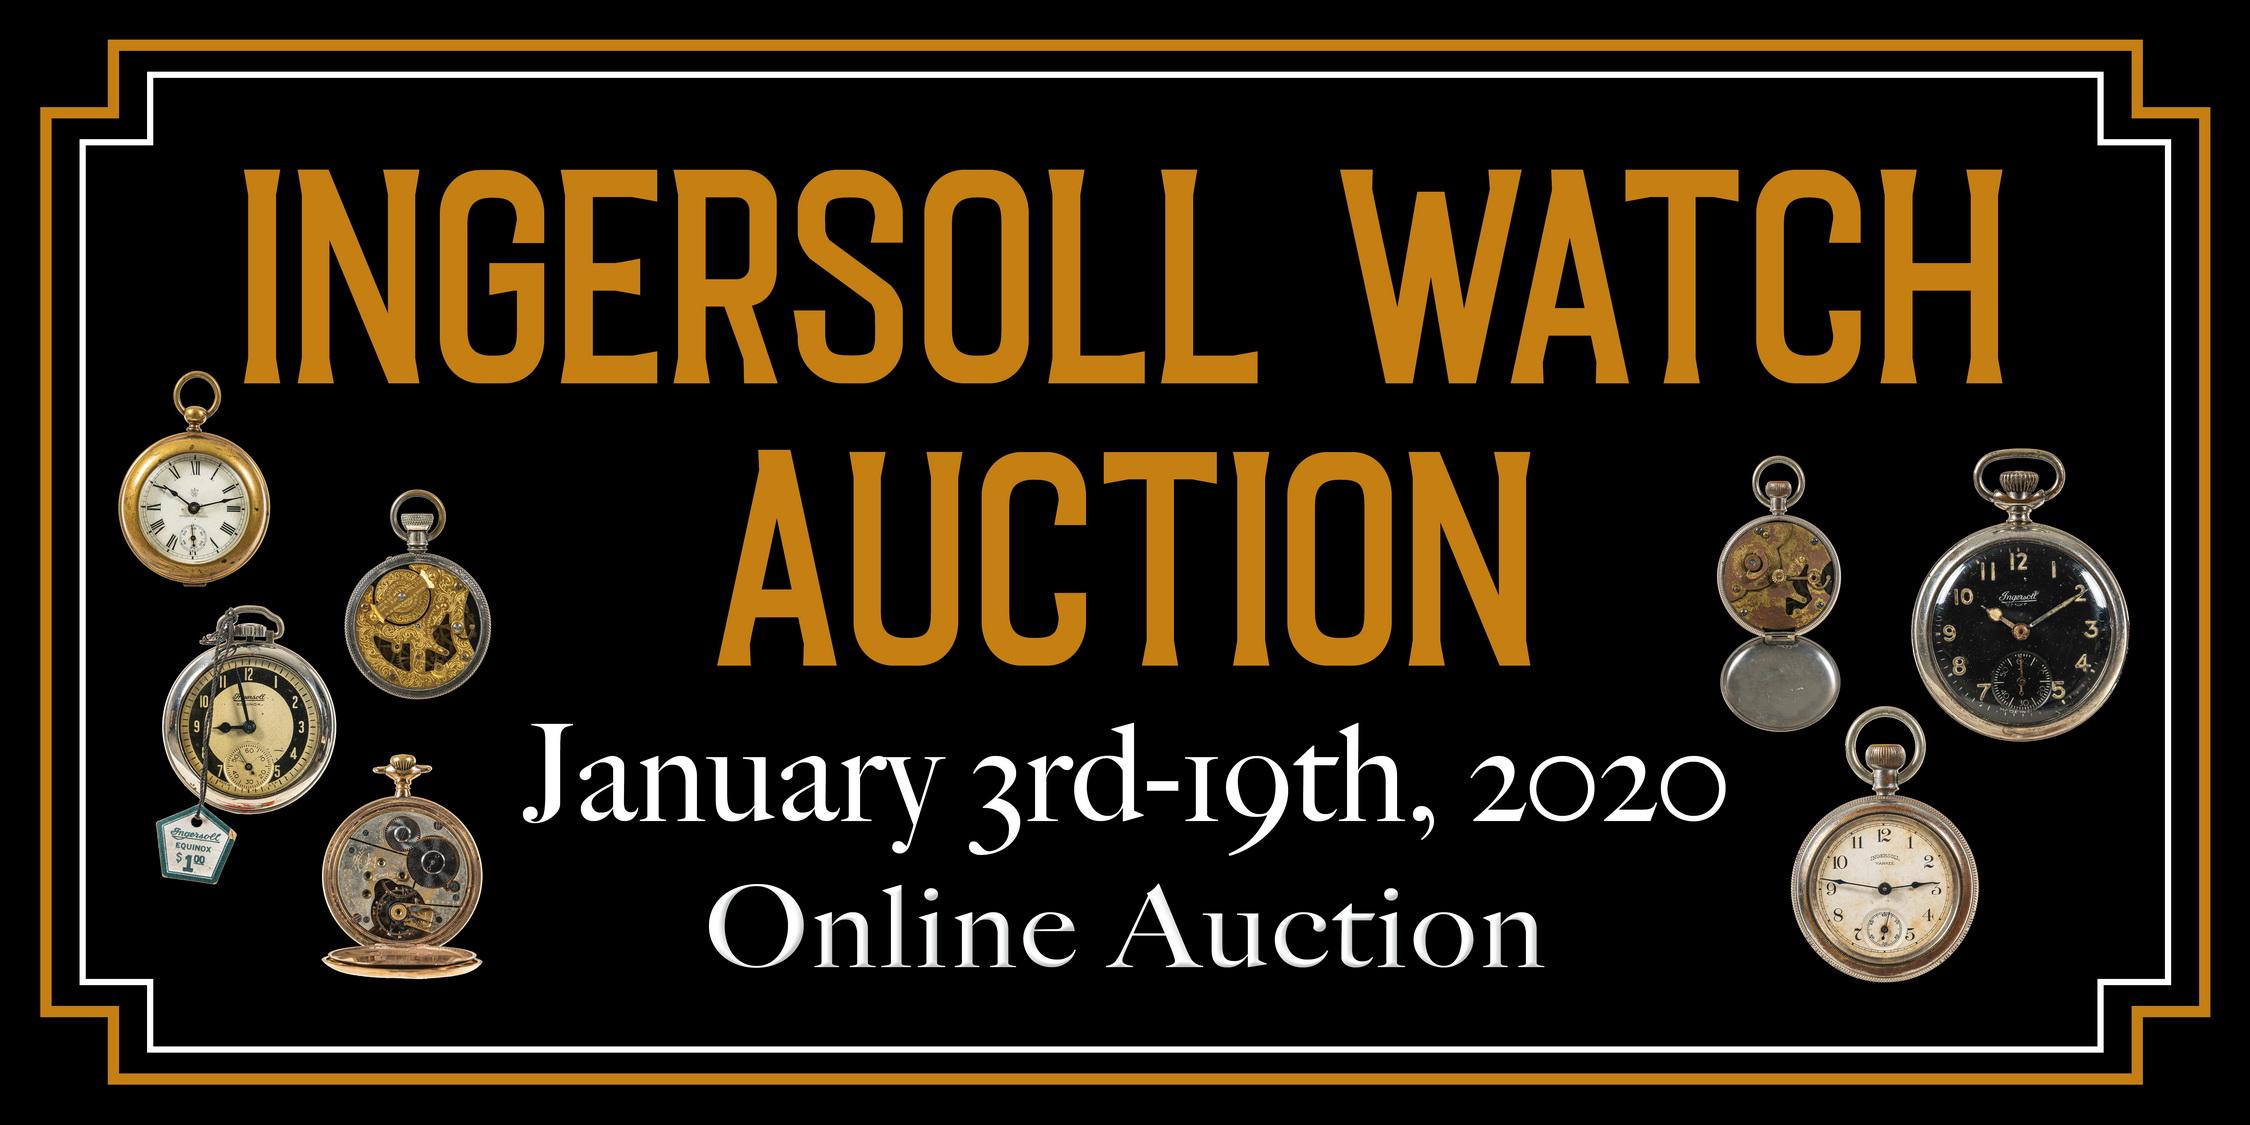 Ingersoll Watch Auction